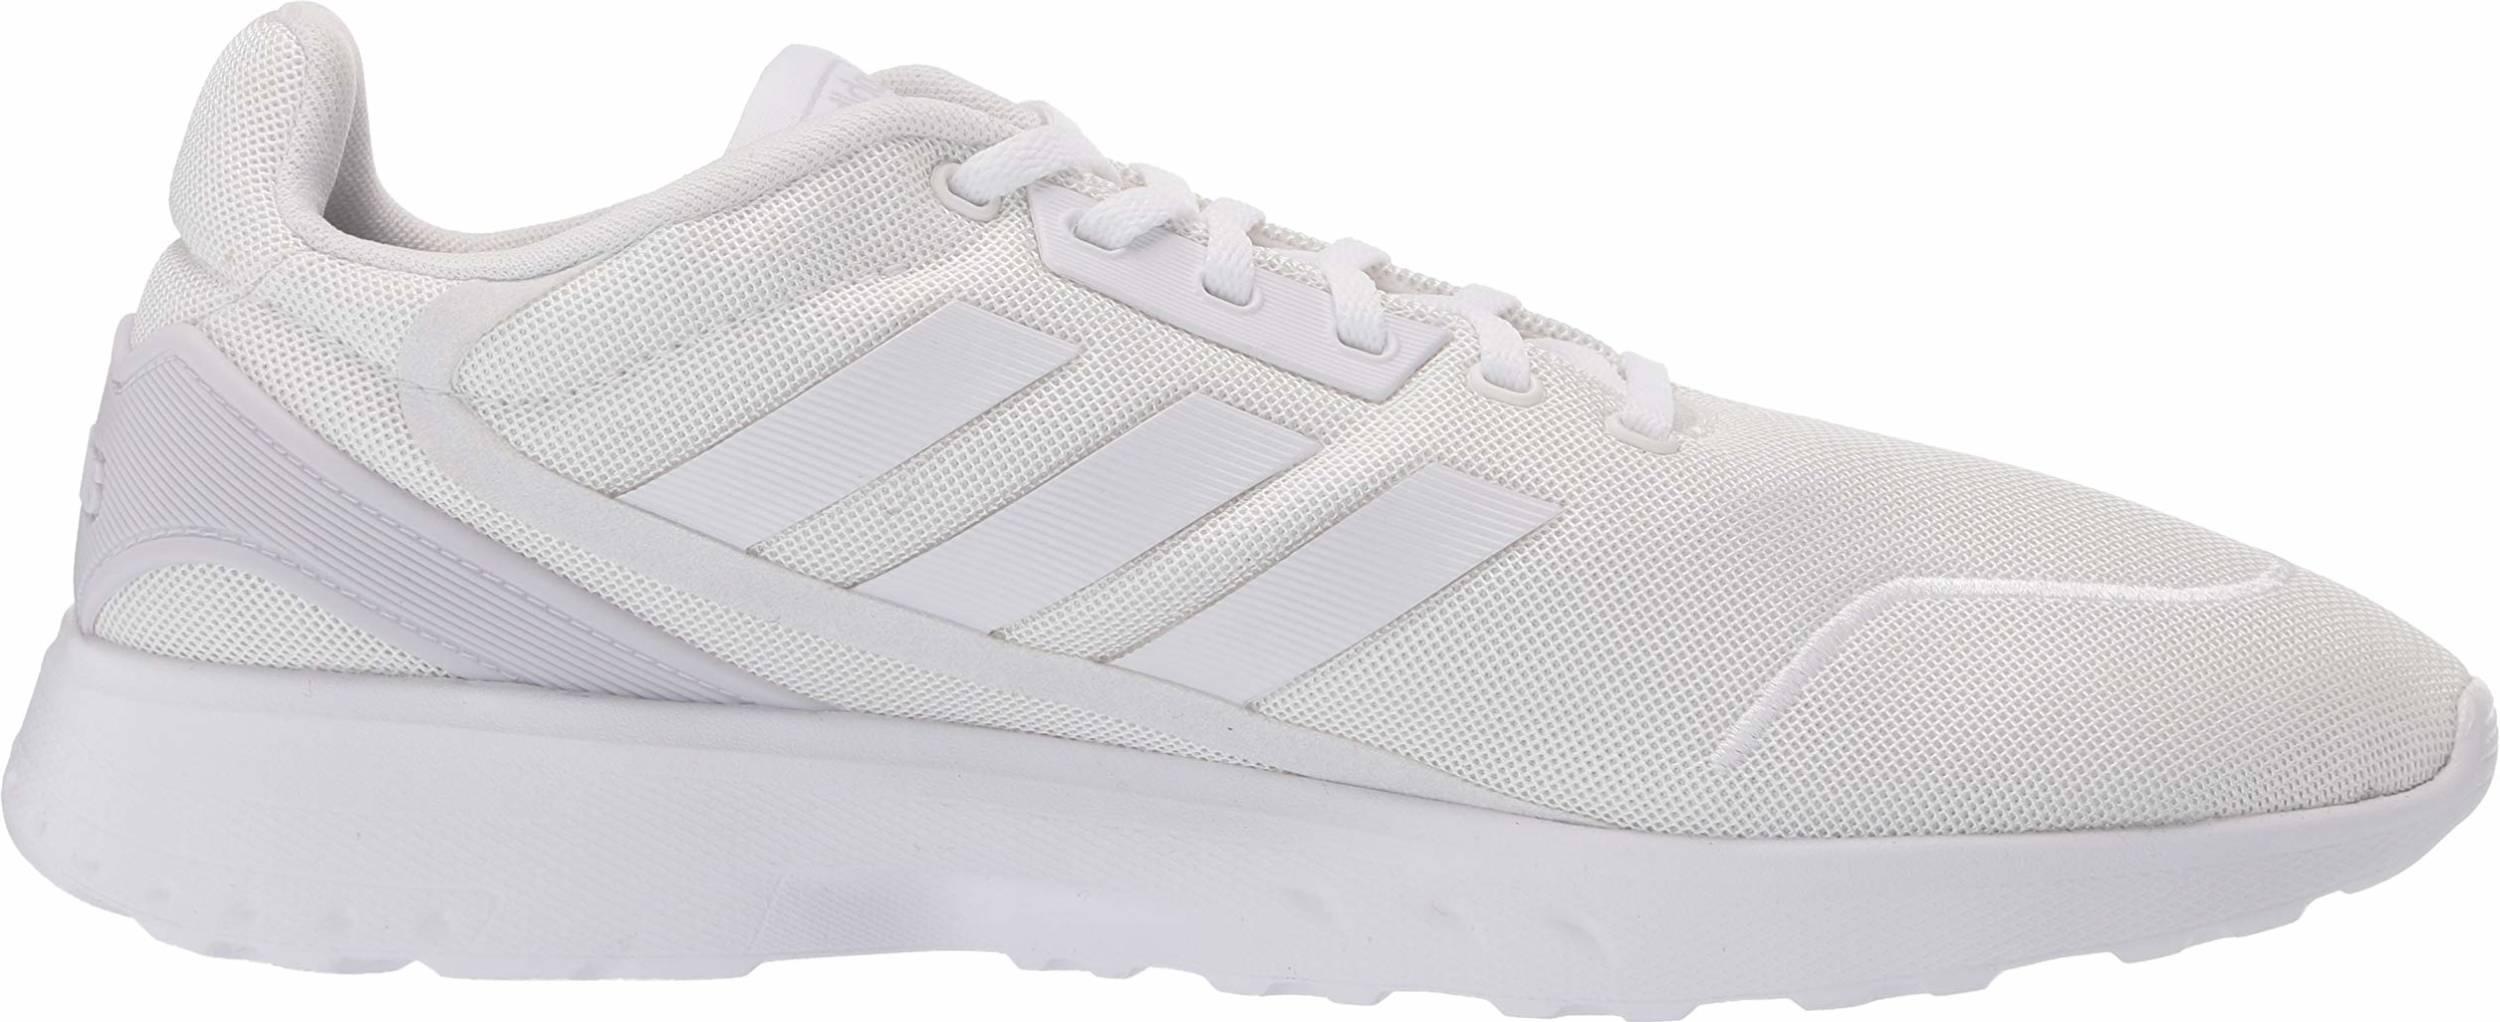 40 Adidas cheap sneakers - Save 41% | RunRepeat